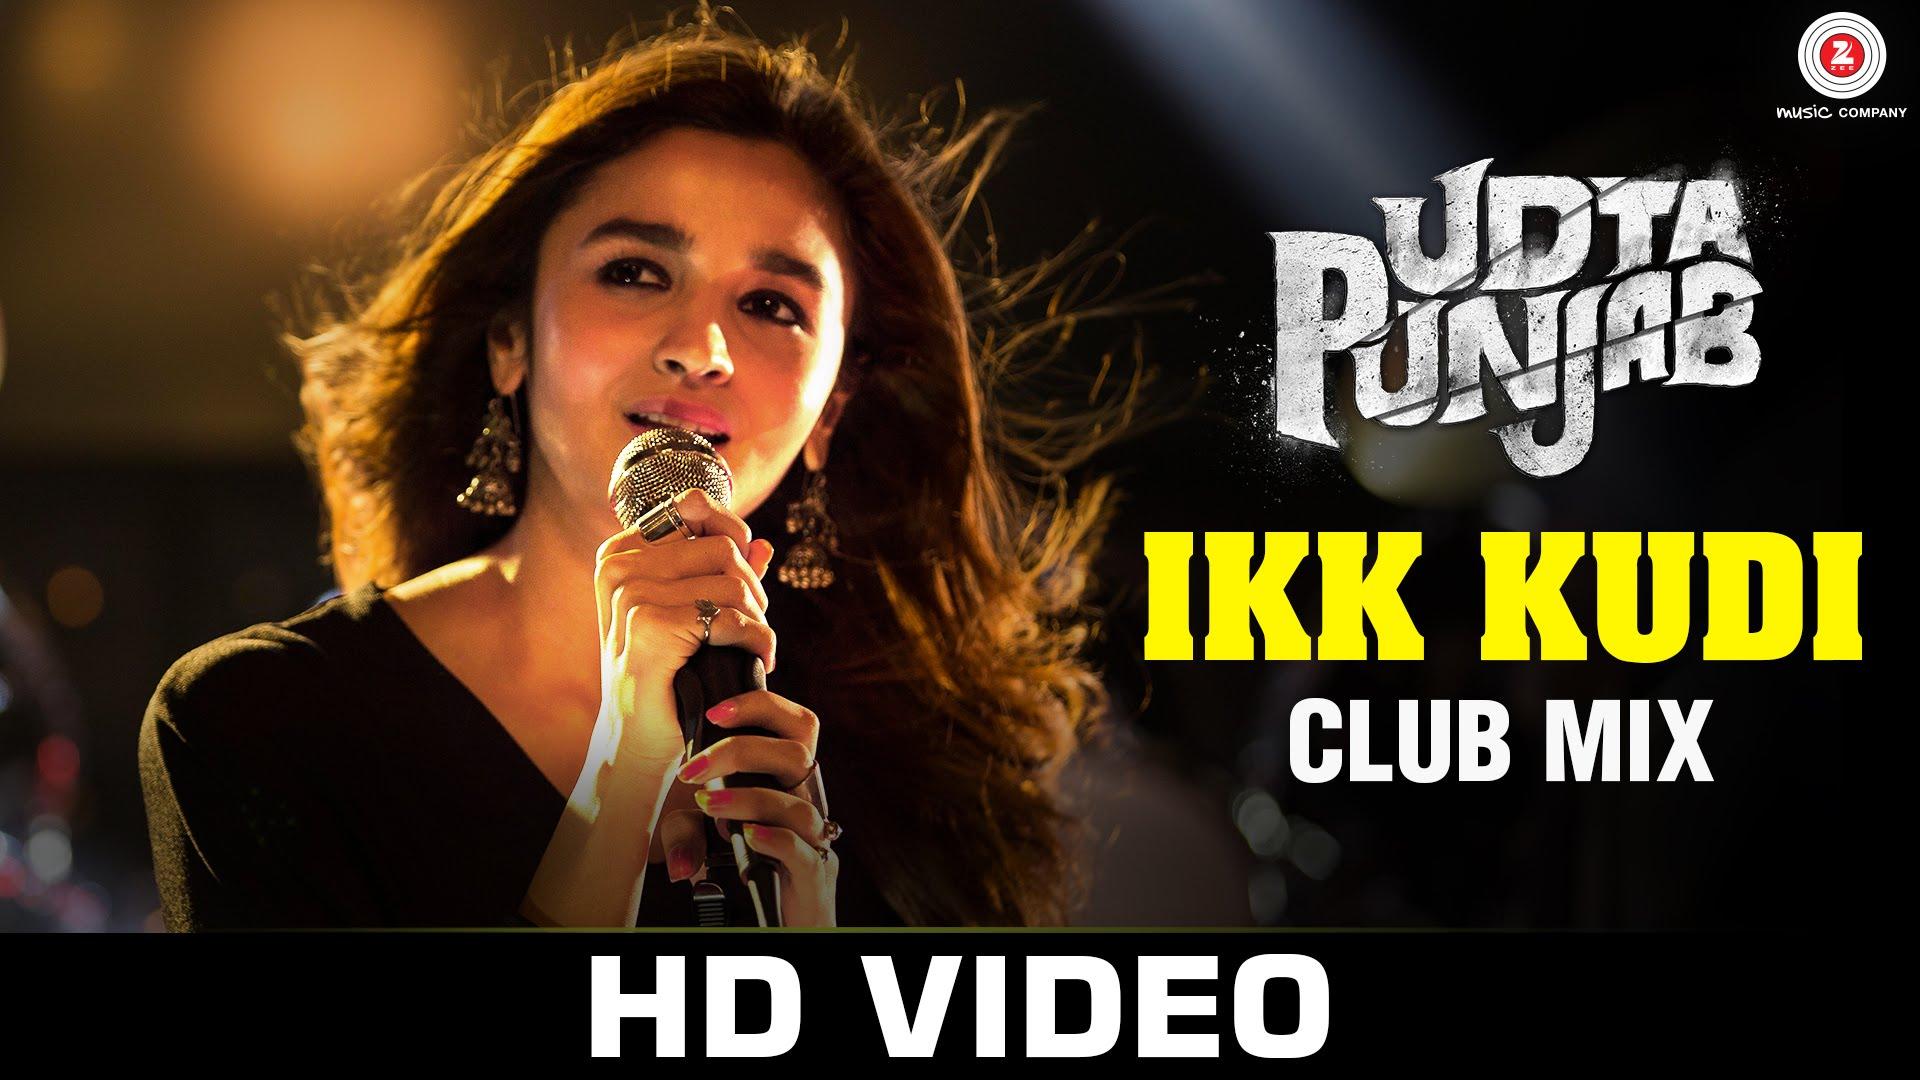 Ikk Kudi (Club Mix) Lyrics & HD Video – Udta Punjab, Alia Bhatt